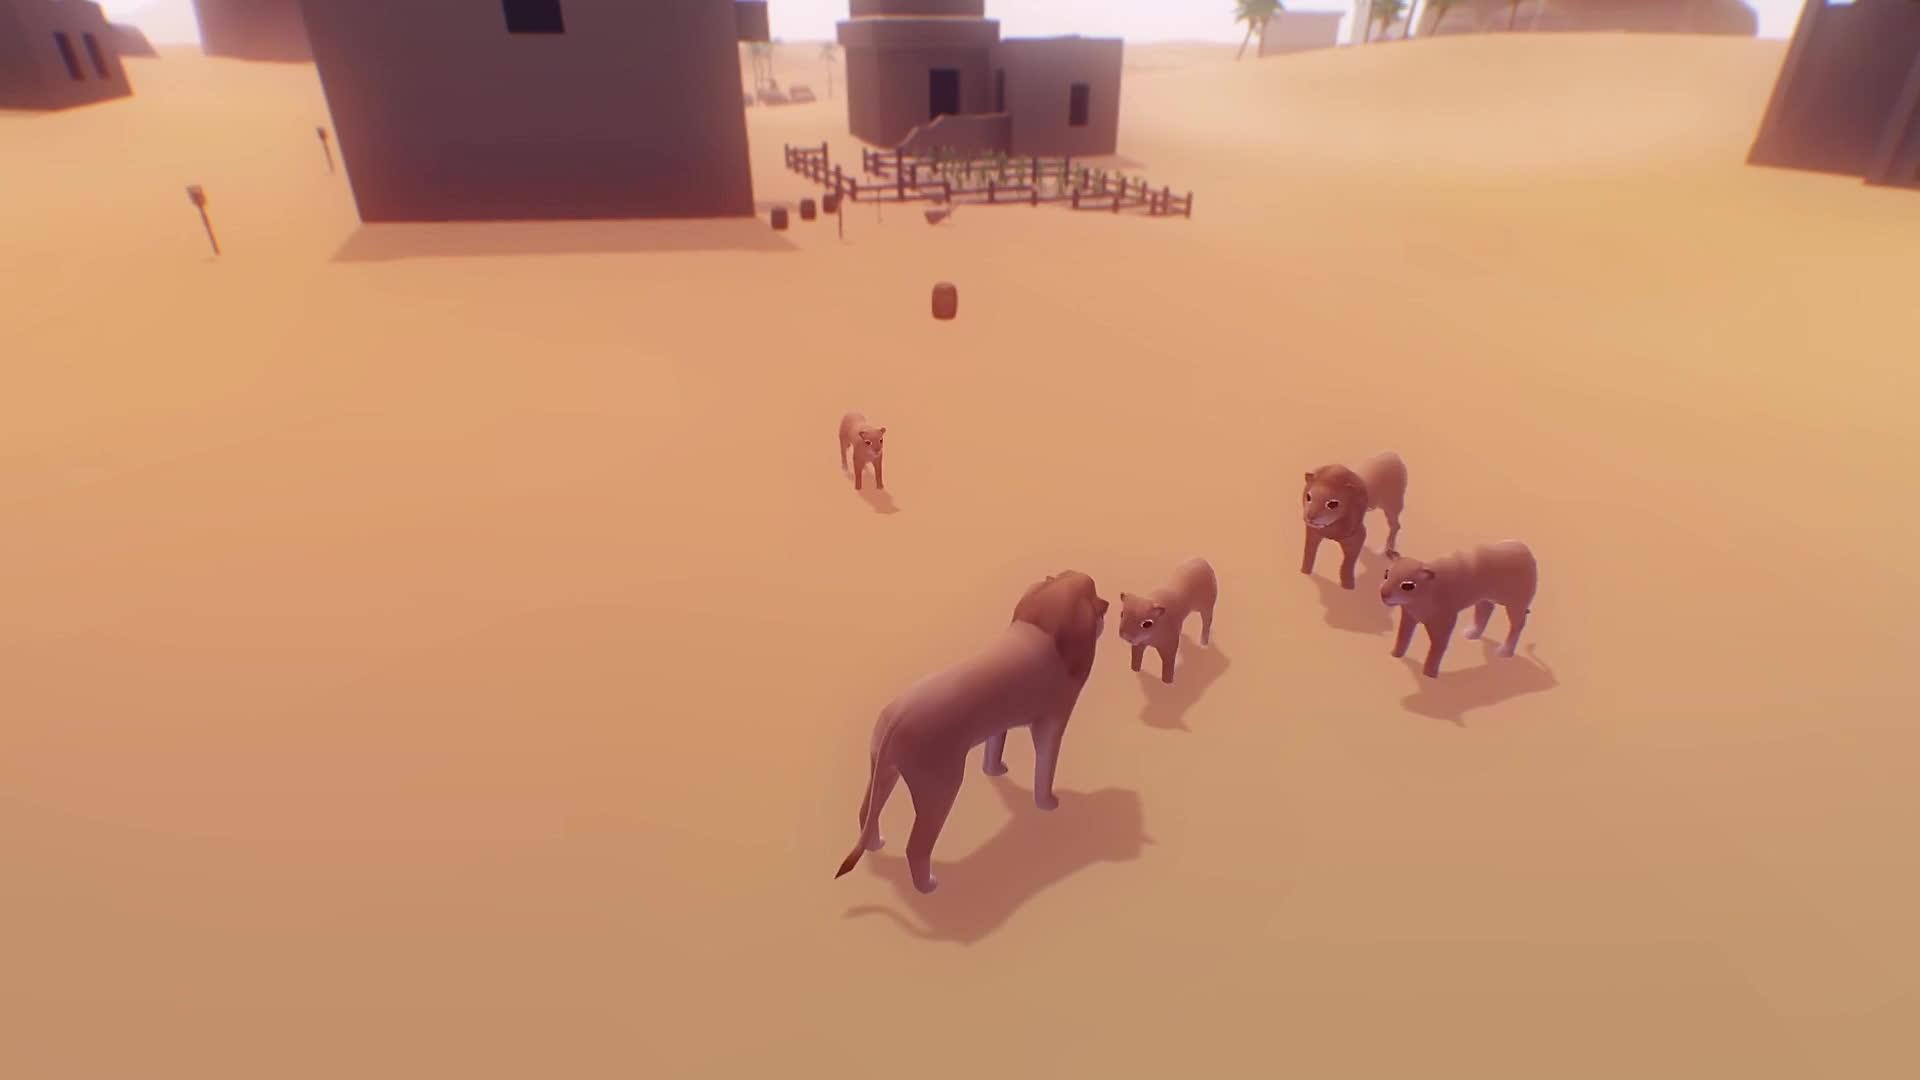 alan watts, david oreilly, gaming, EVERYTHING - Gameplay Trailer   PS4 GIFs